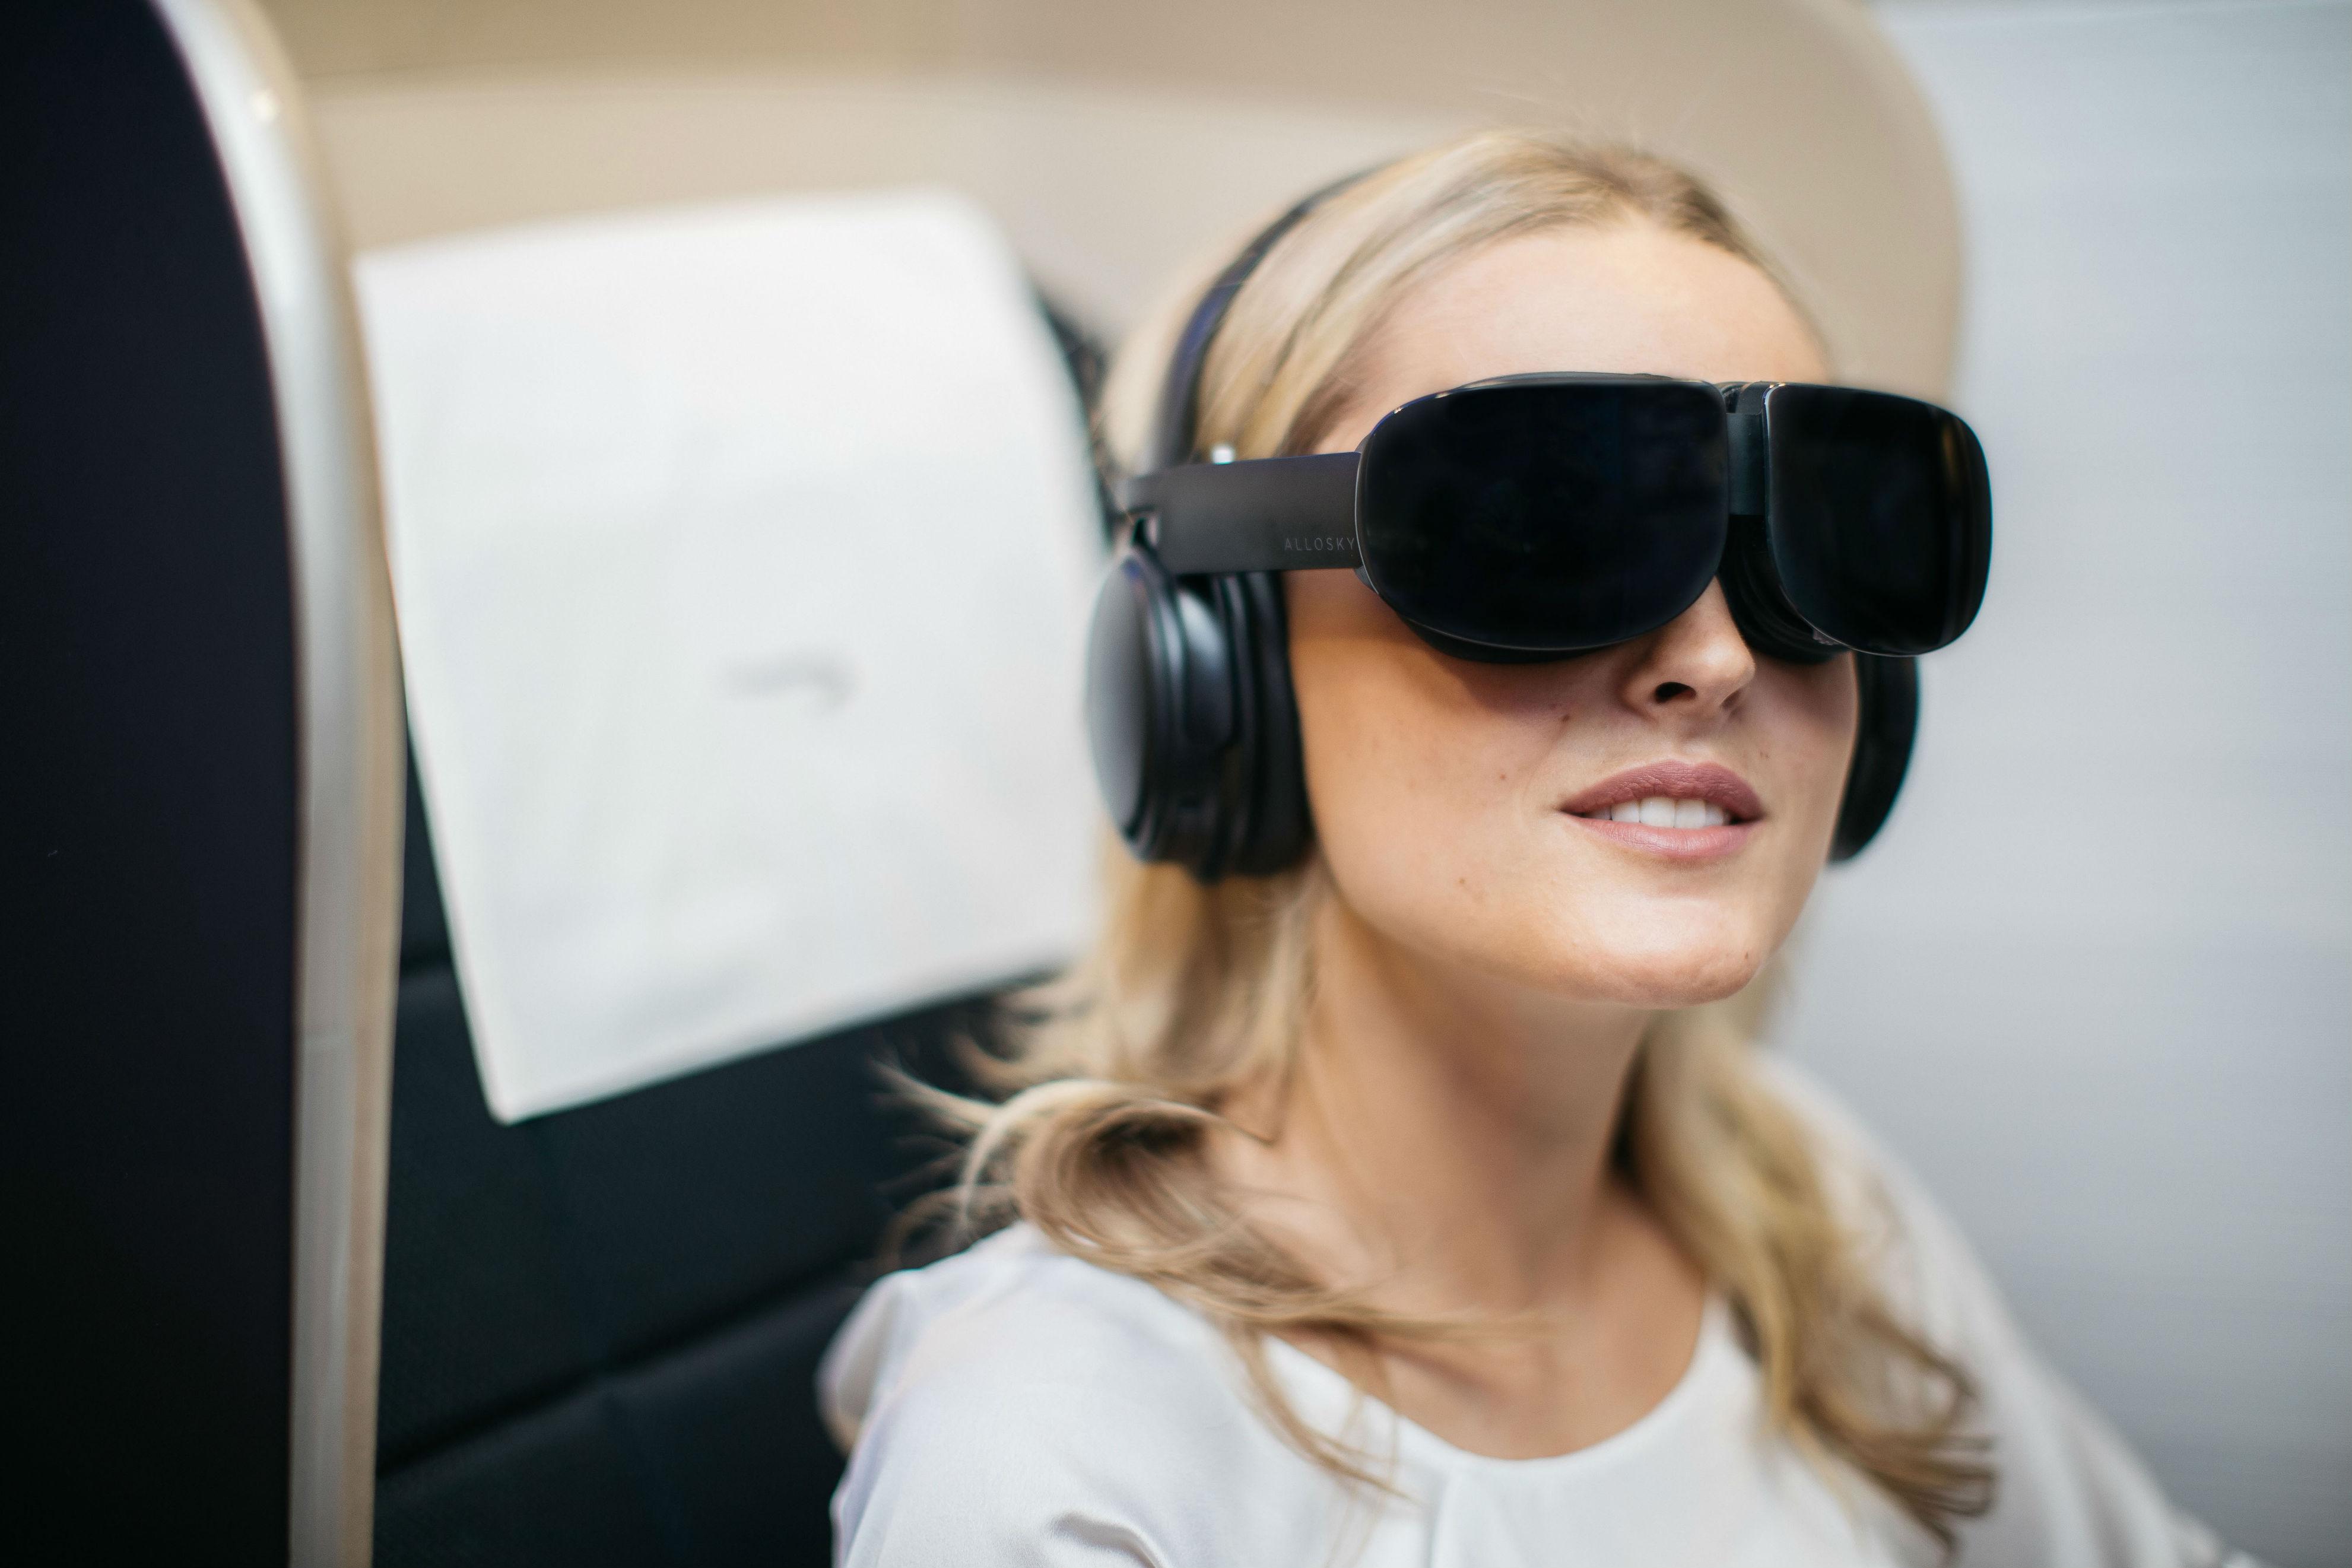 British Airways begins trialling onboard VR headsets